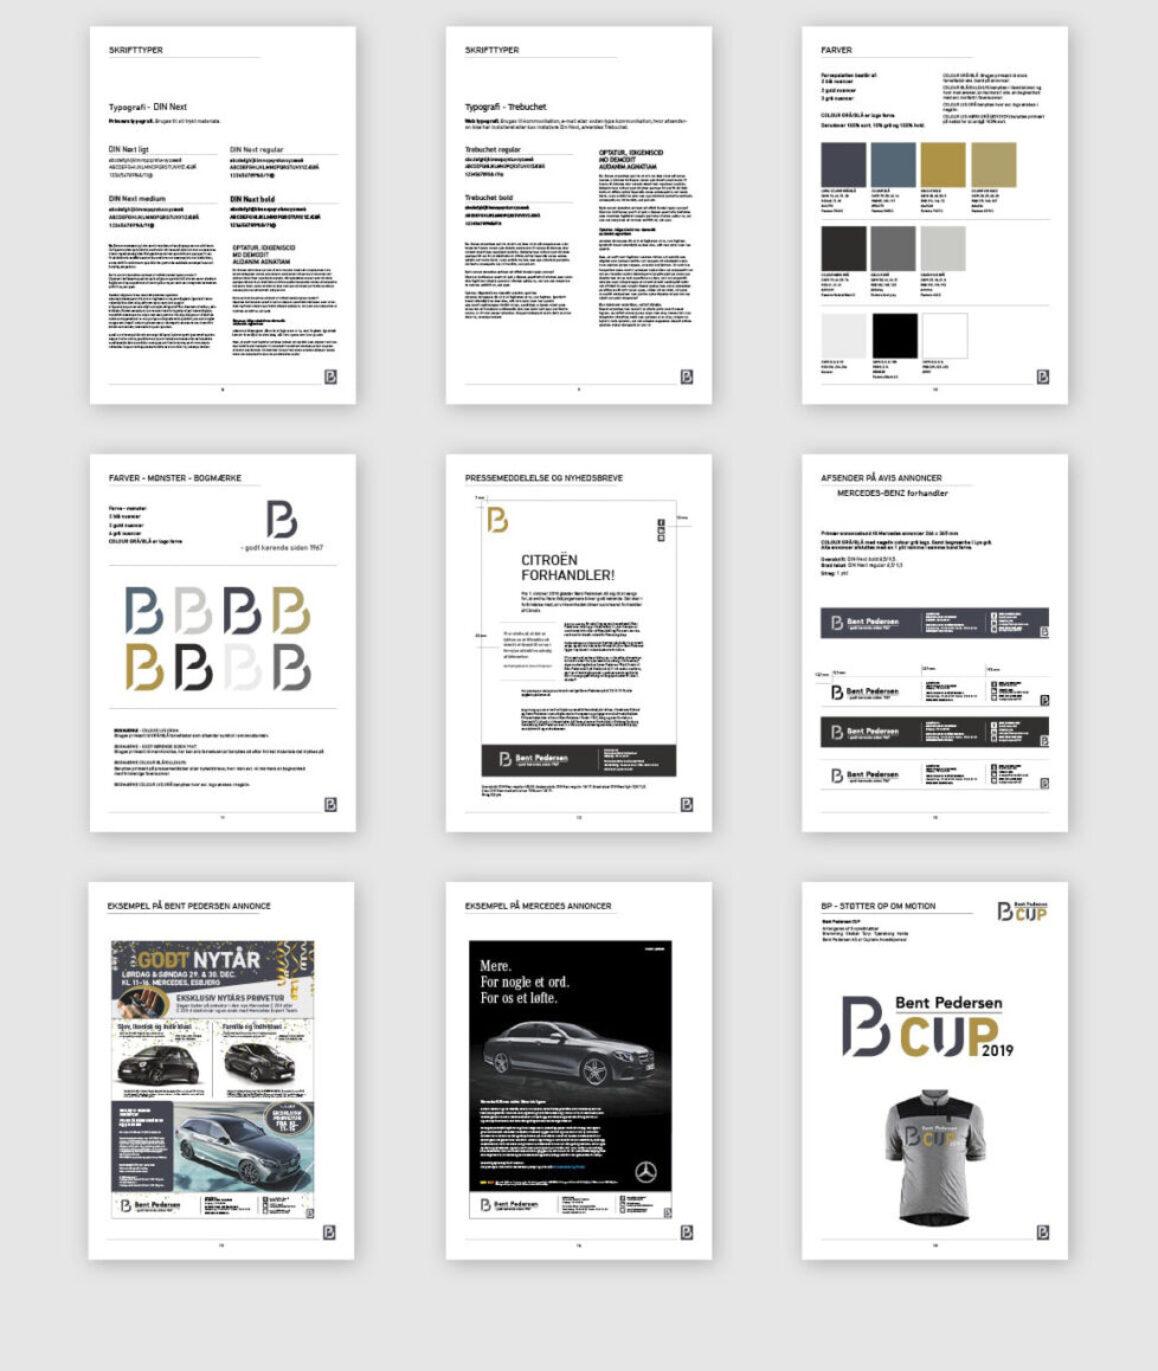 Bent-Pedersen-Design-Guide-Linda Kongerslev